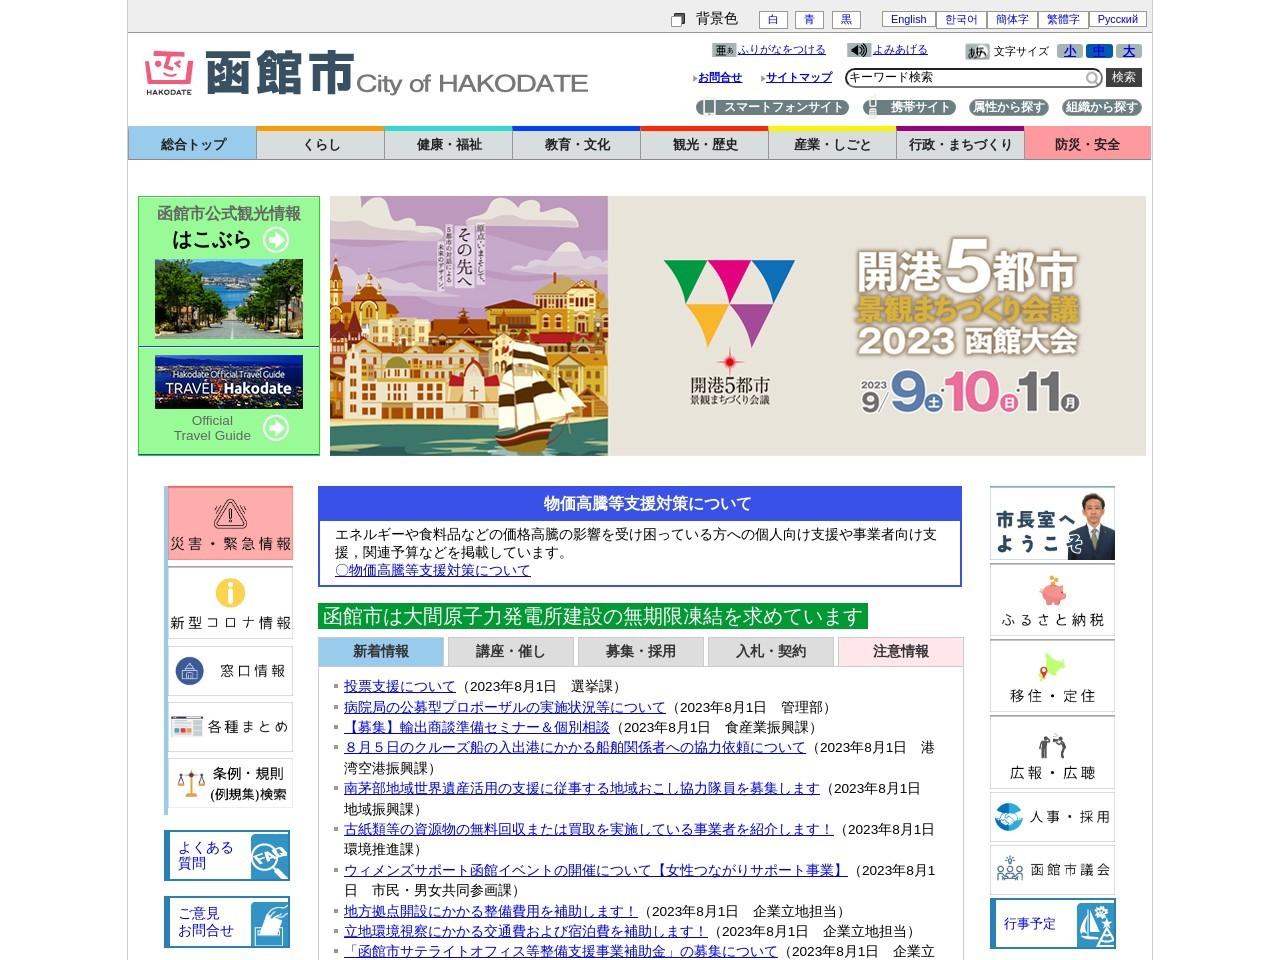 http://www.city.hakodate.hokkaido.jp/docs/2017111600034/